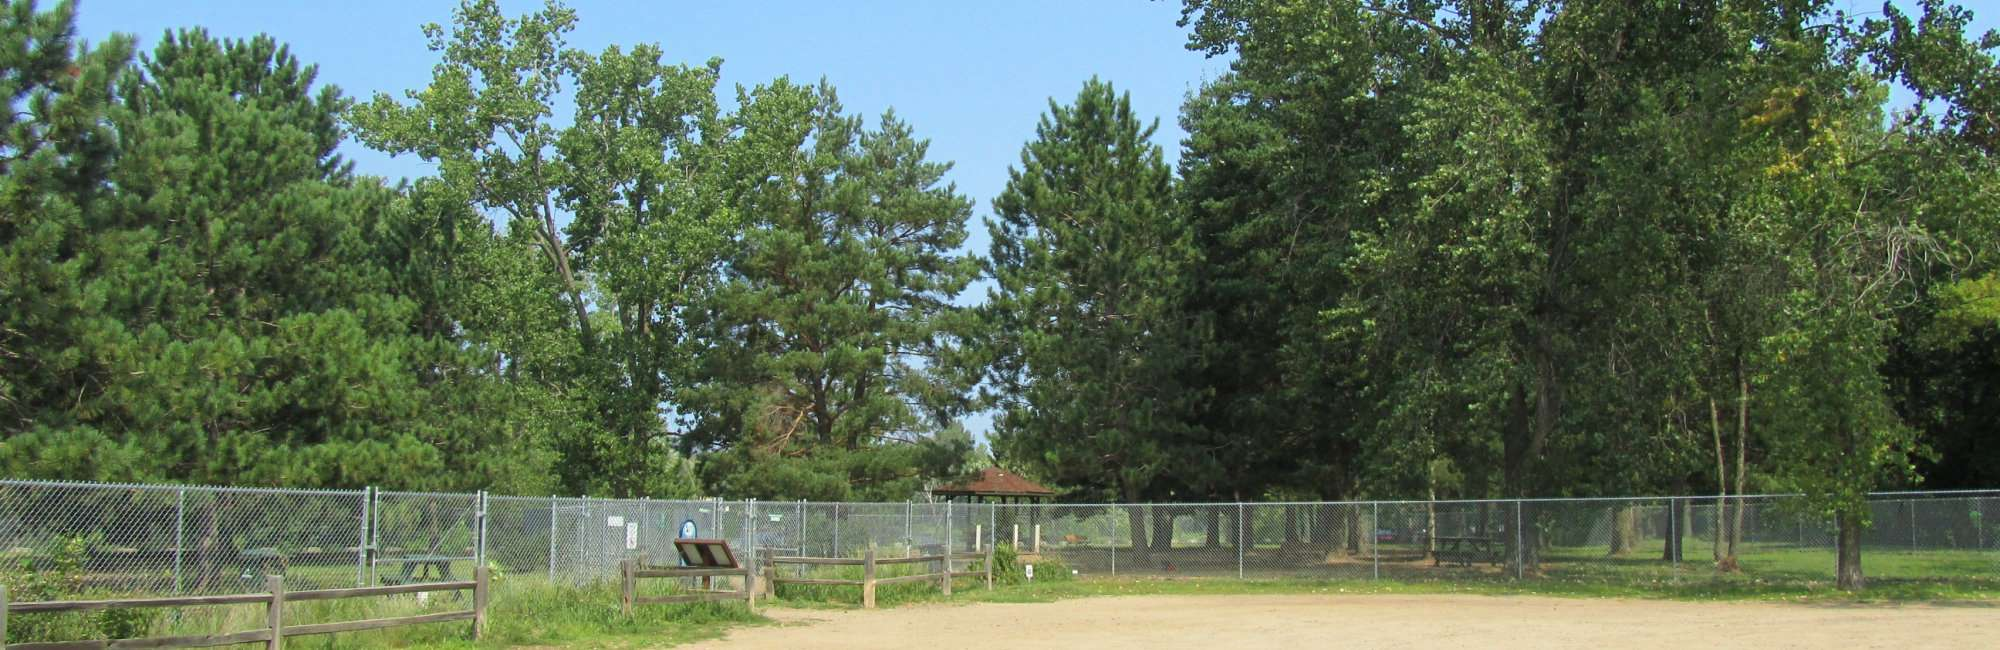 Slide-Recreation-Parks-Busters